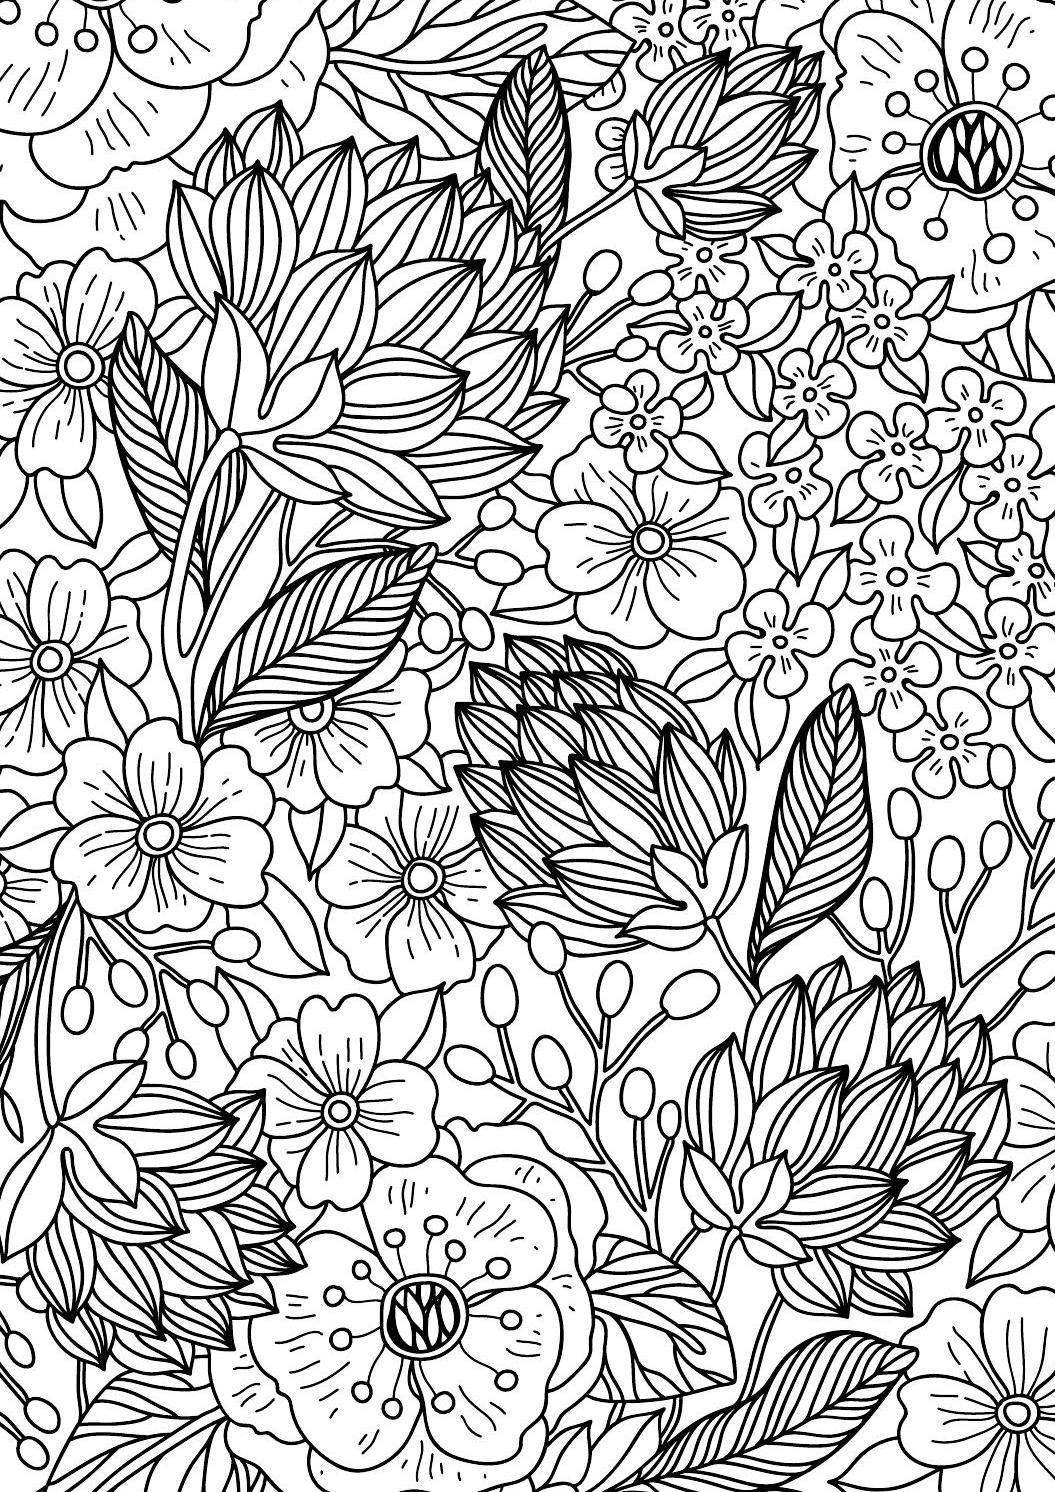 Colour Calm 04 Sampler Flower Coloring Pages